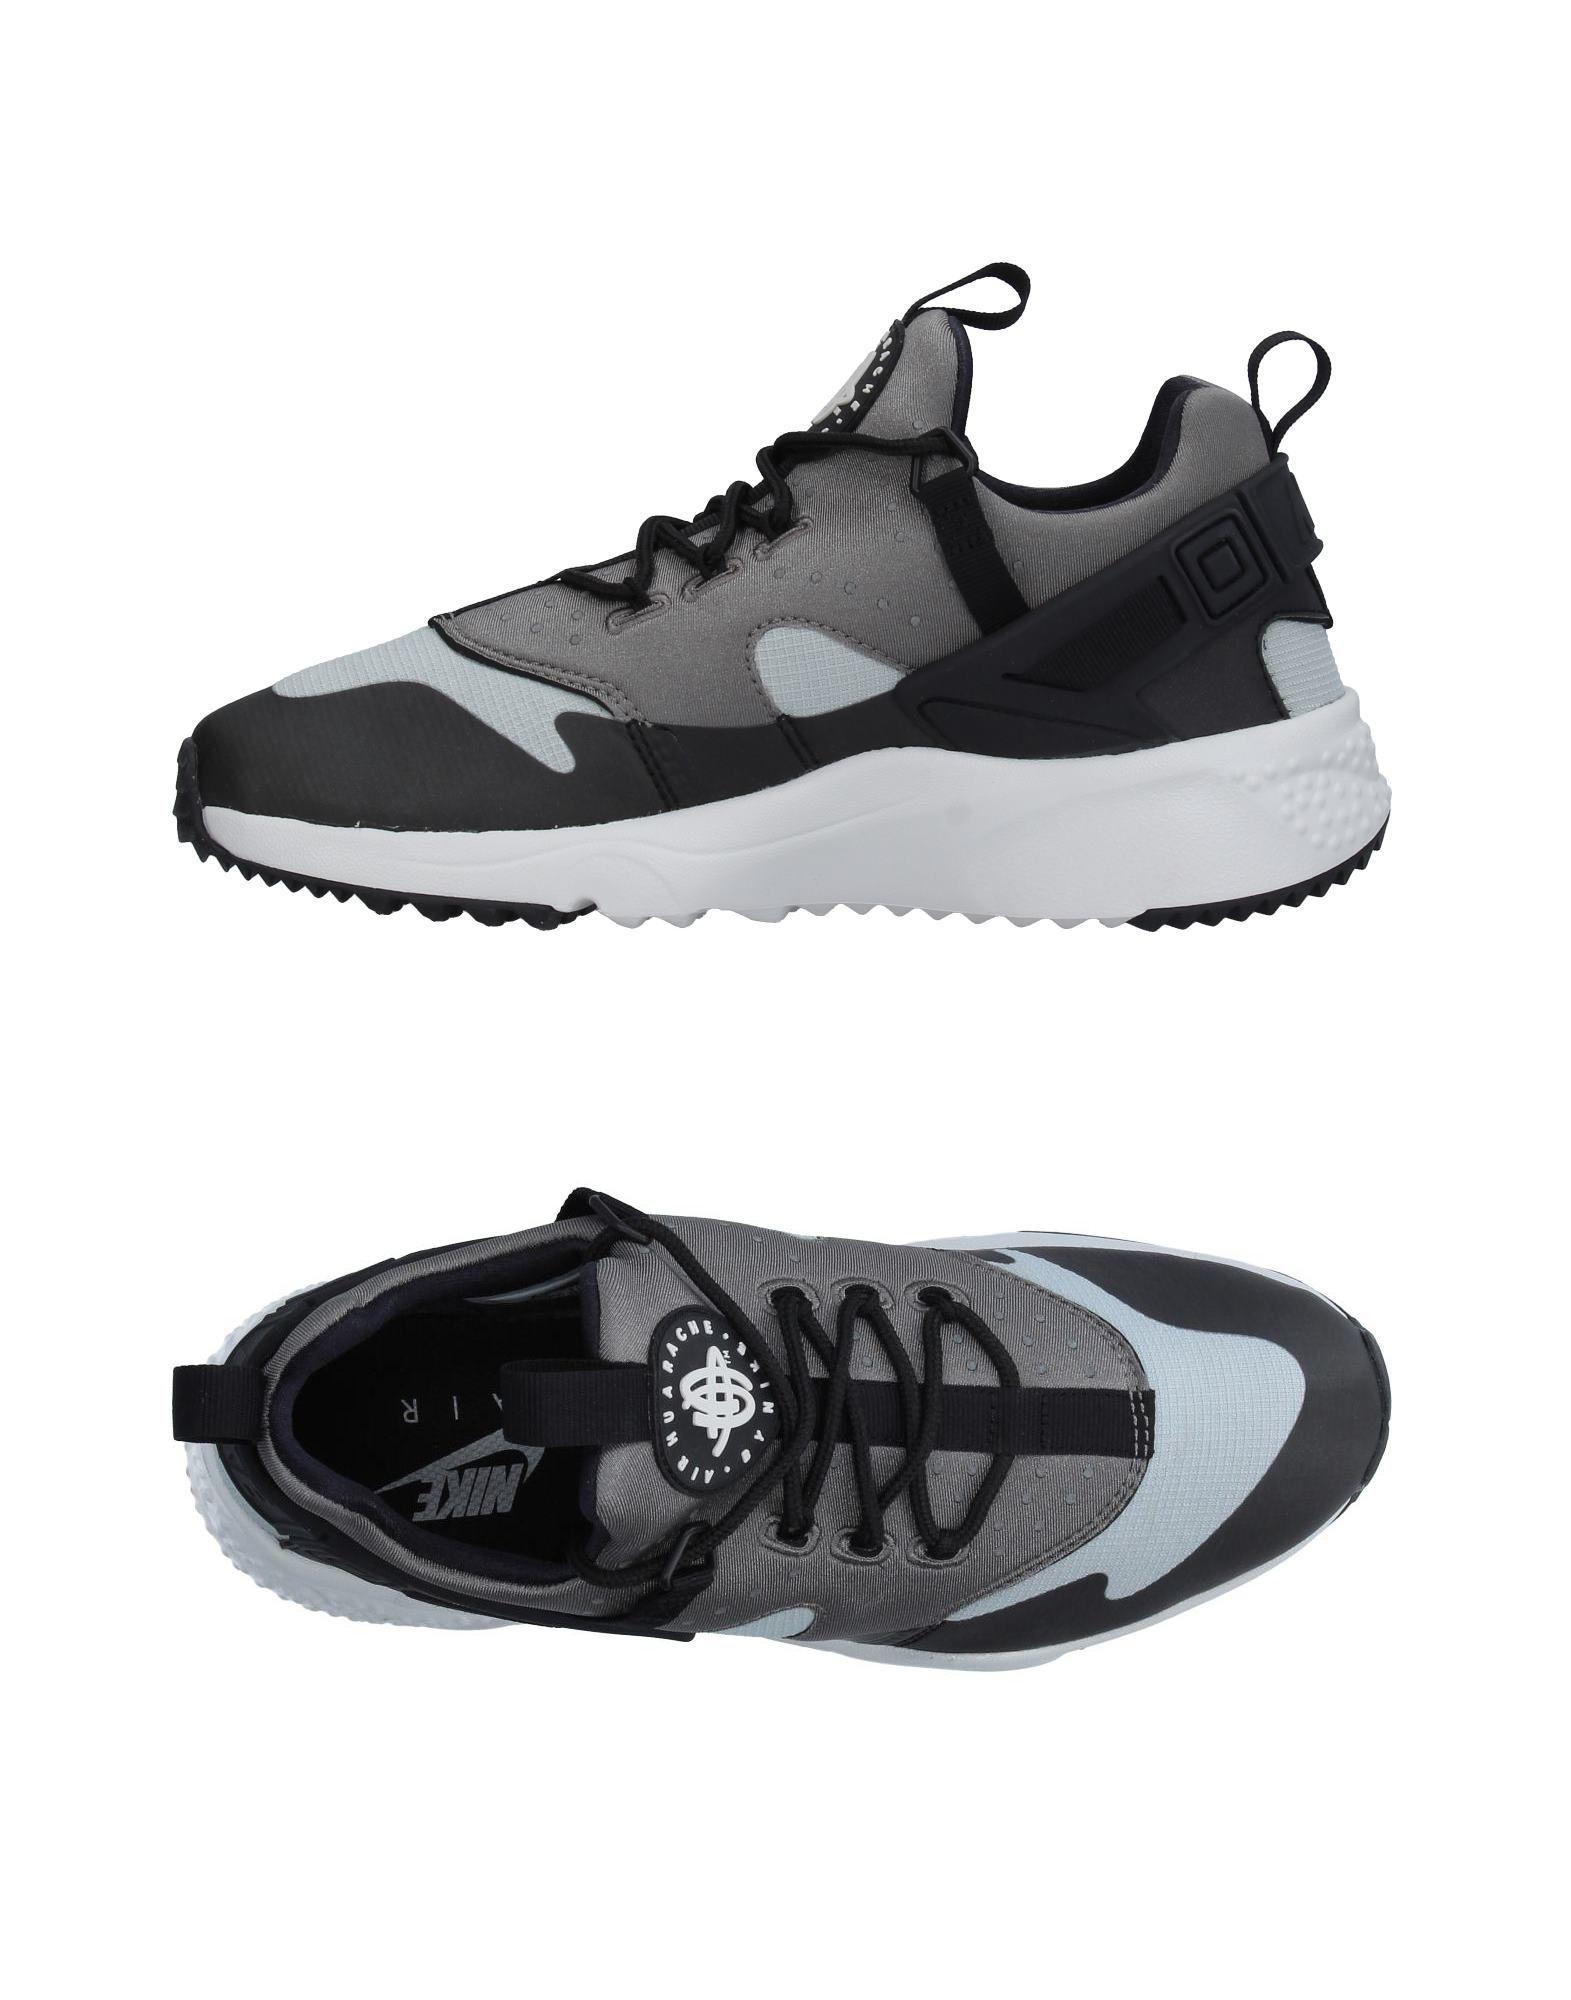 Moda Sneakers Nike Uomo - 11234957KQ